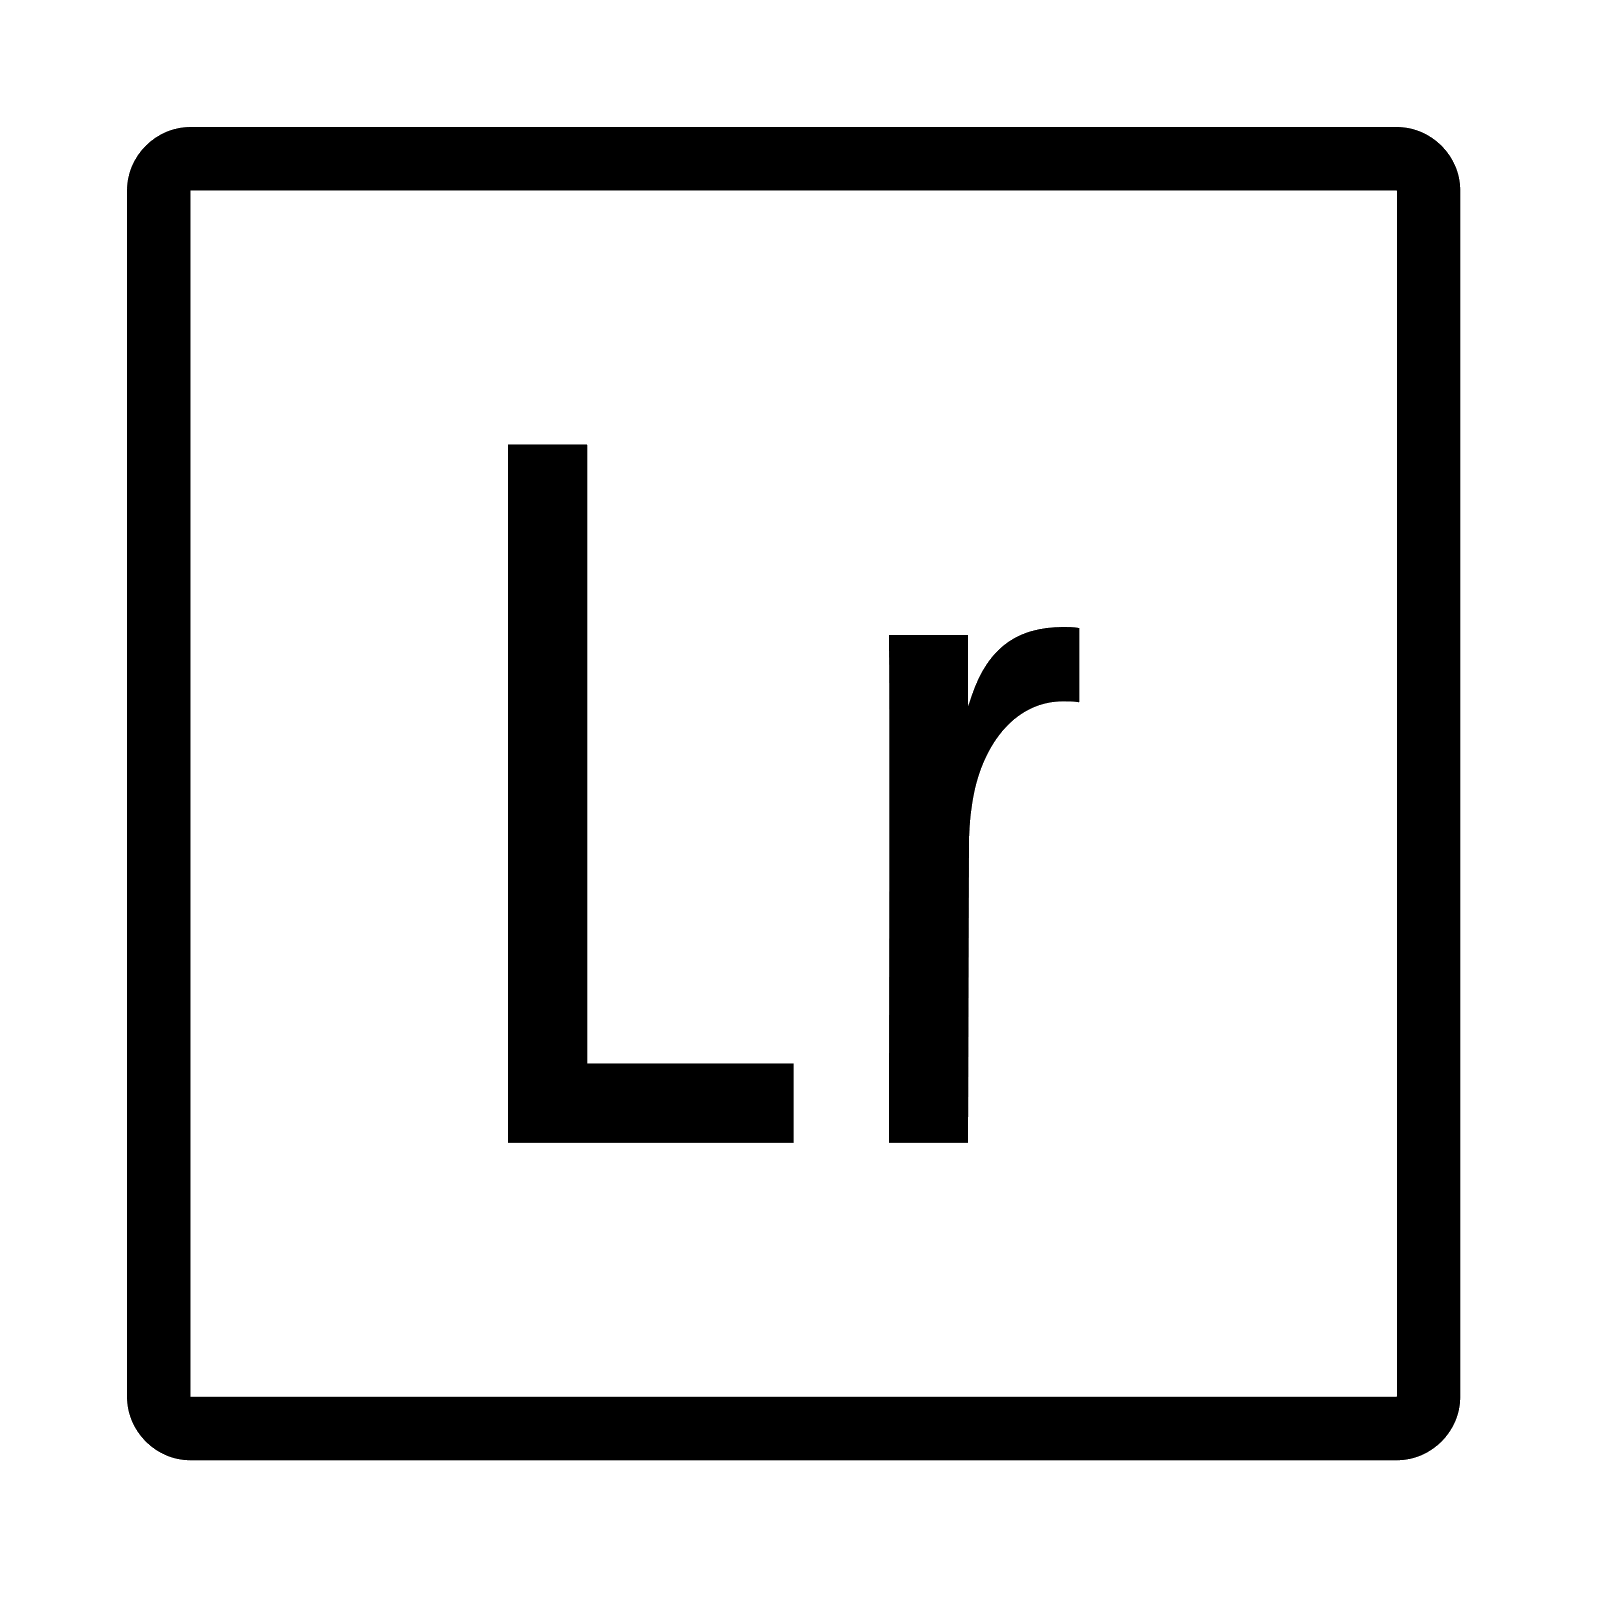 Adobe Black Vector Png Hdpng.com 1600 - Adobe Black Vector, Transparent background PNG HD thumbnail